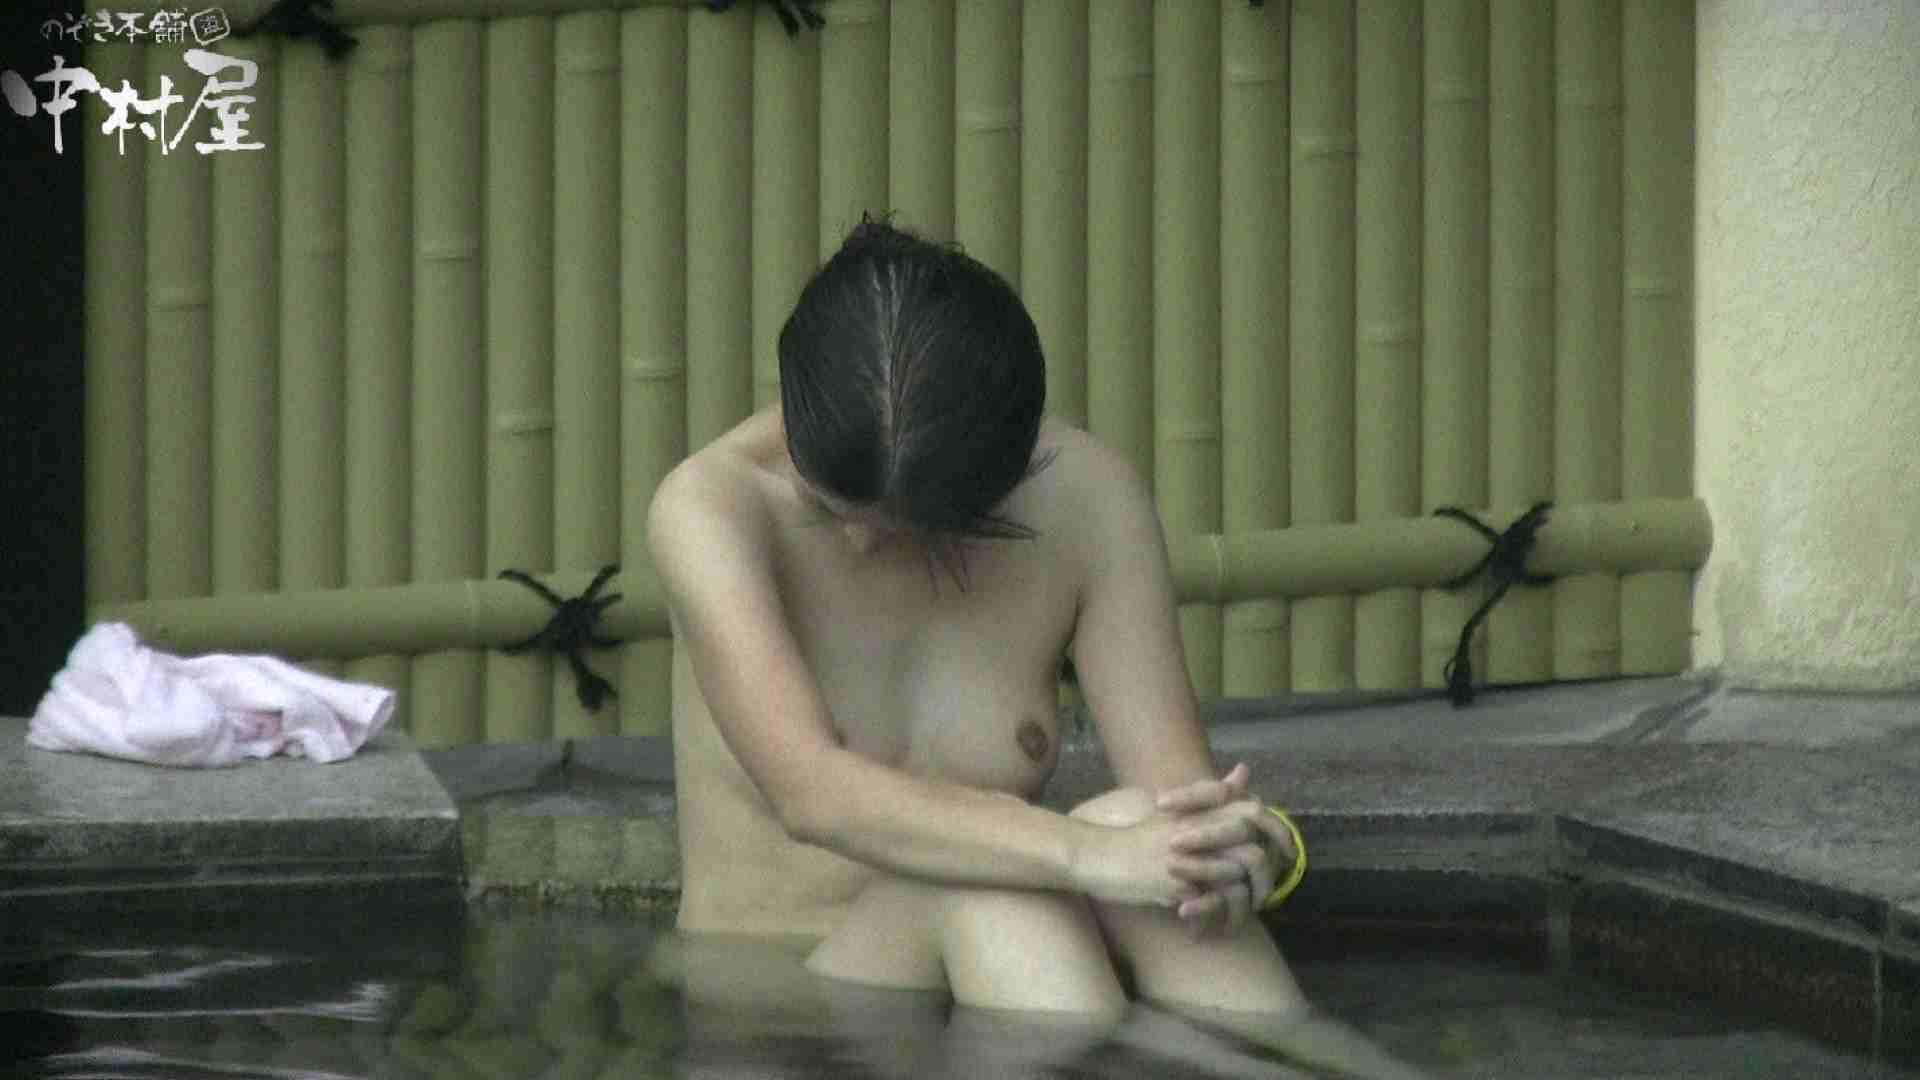 Aquaな露天風呂Vol.904 OL  60連発 47